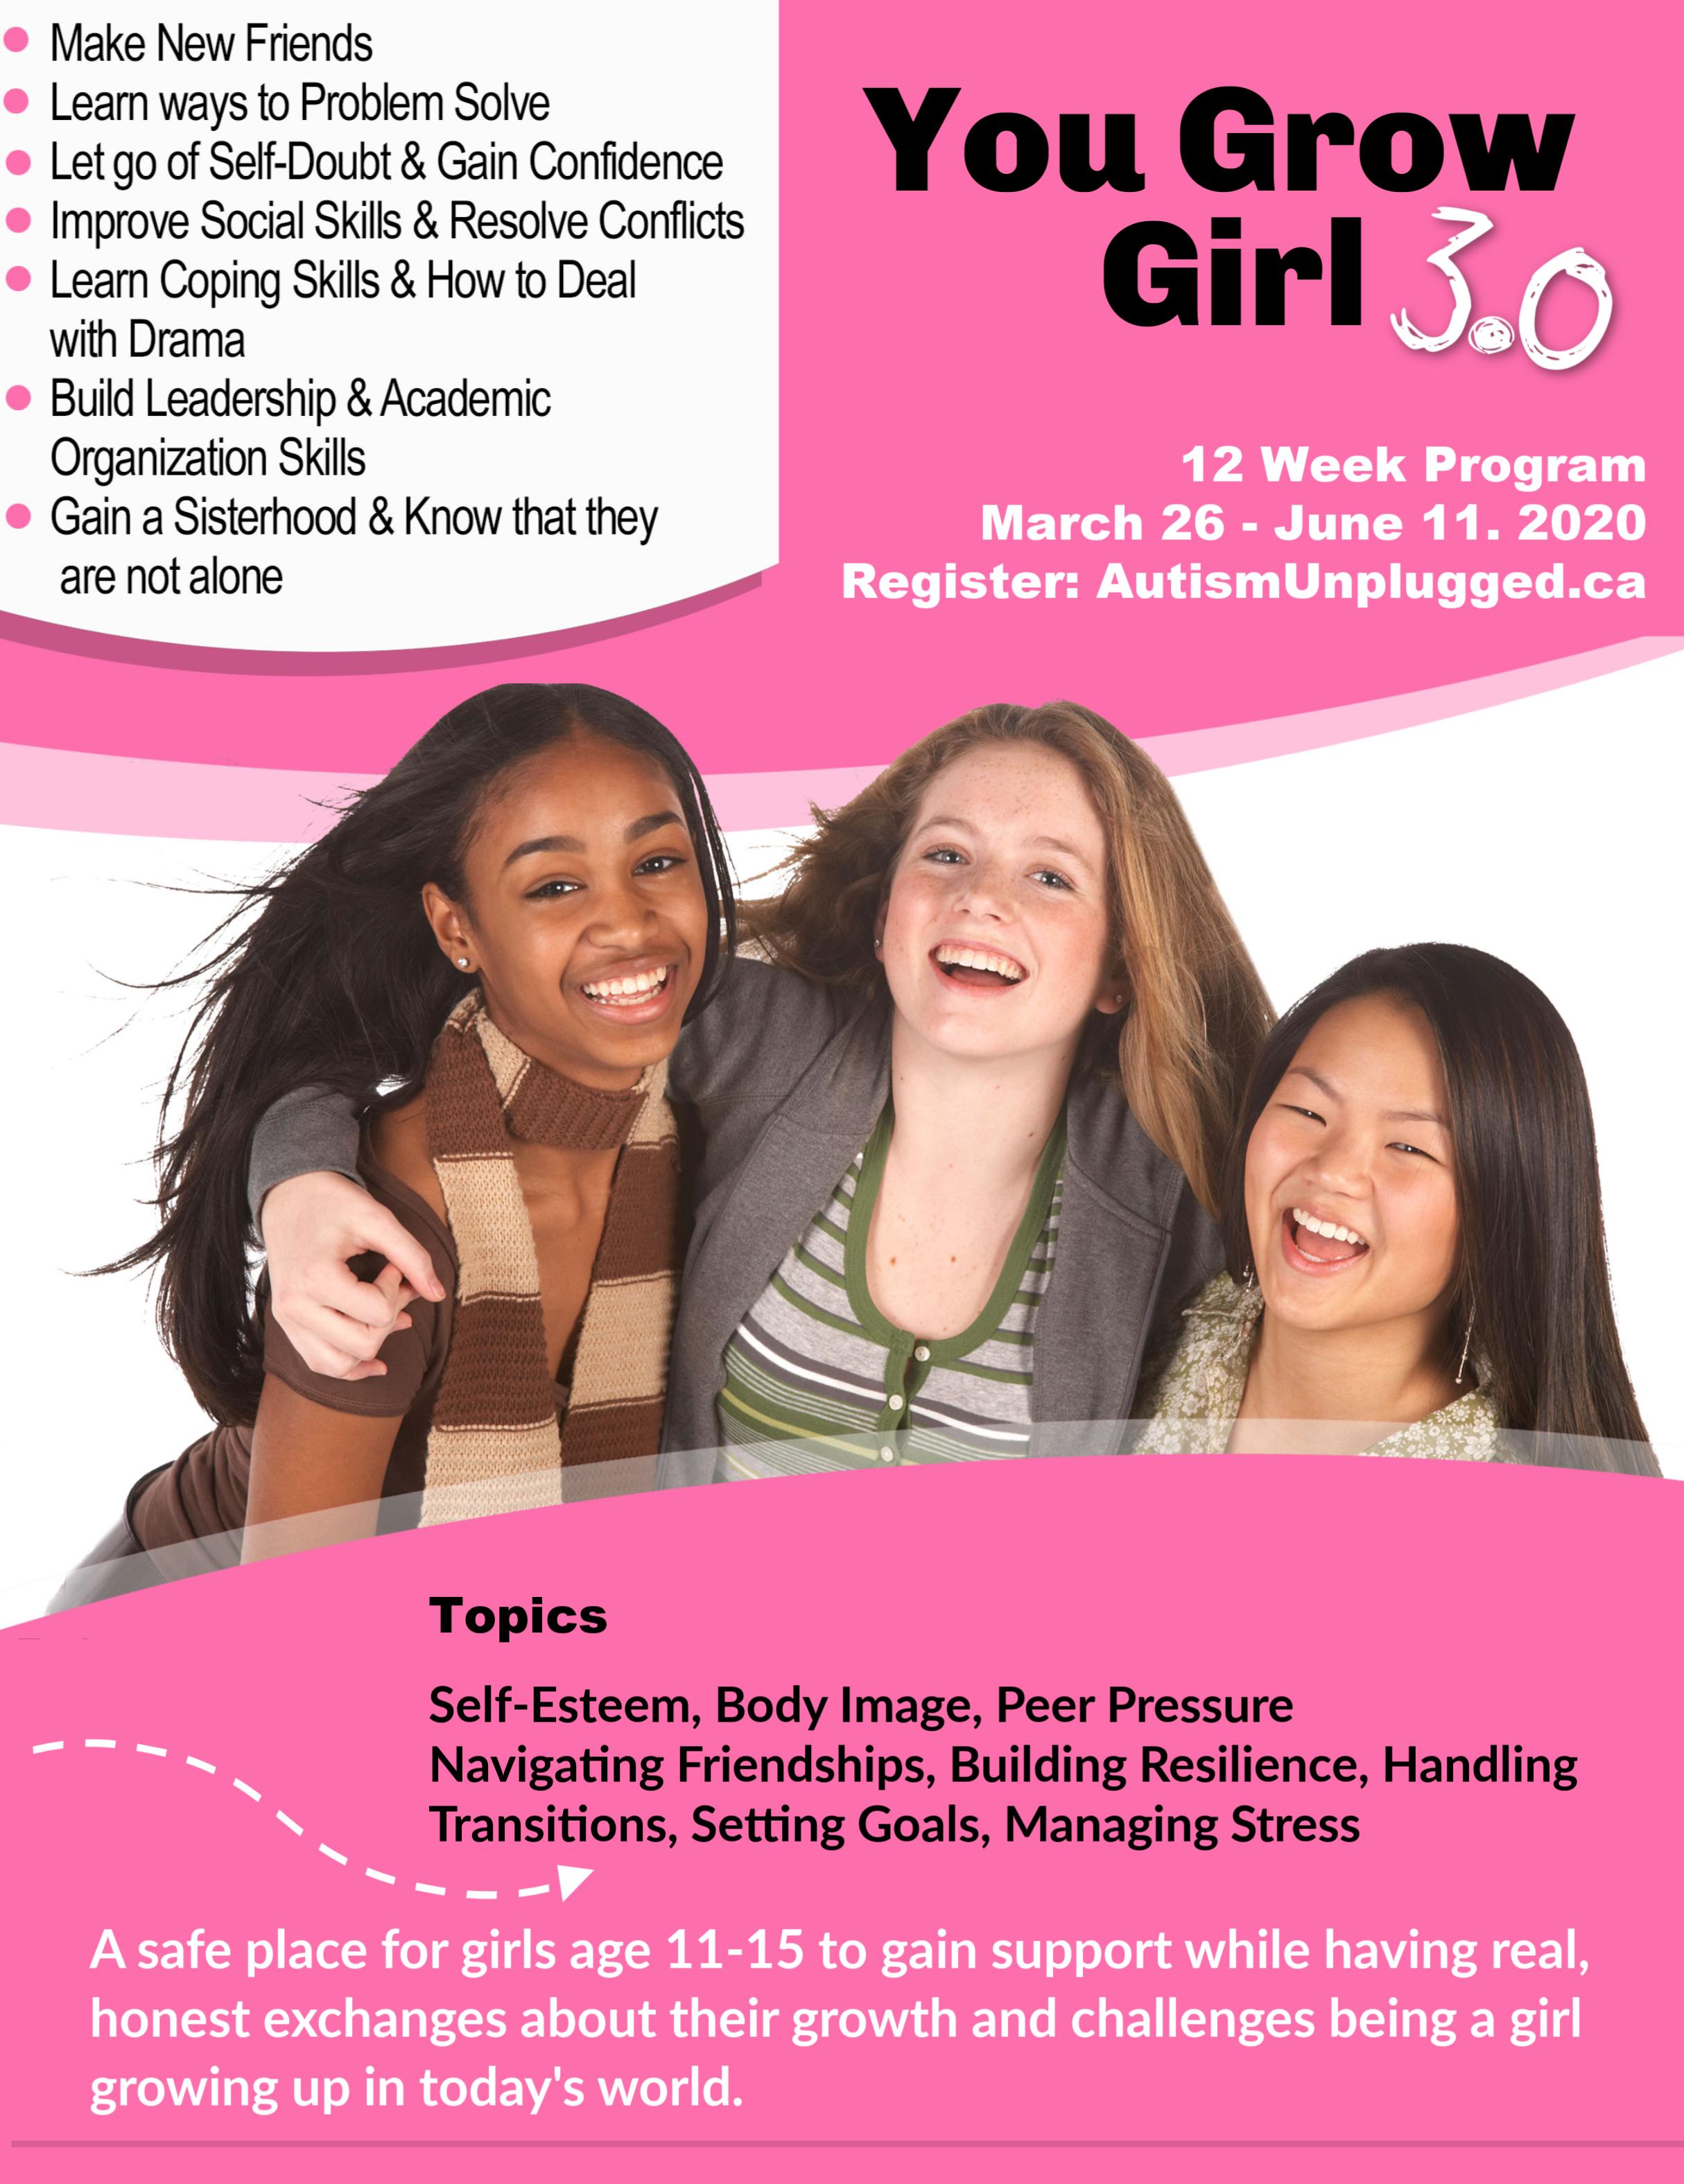 You Grow Girl Social Learning Group 3.0